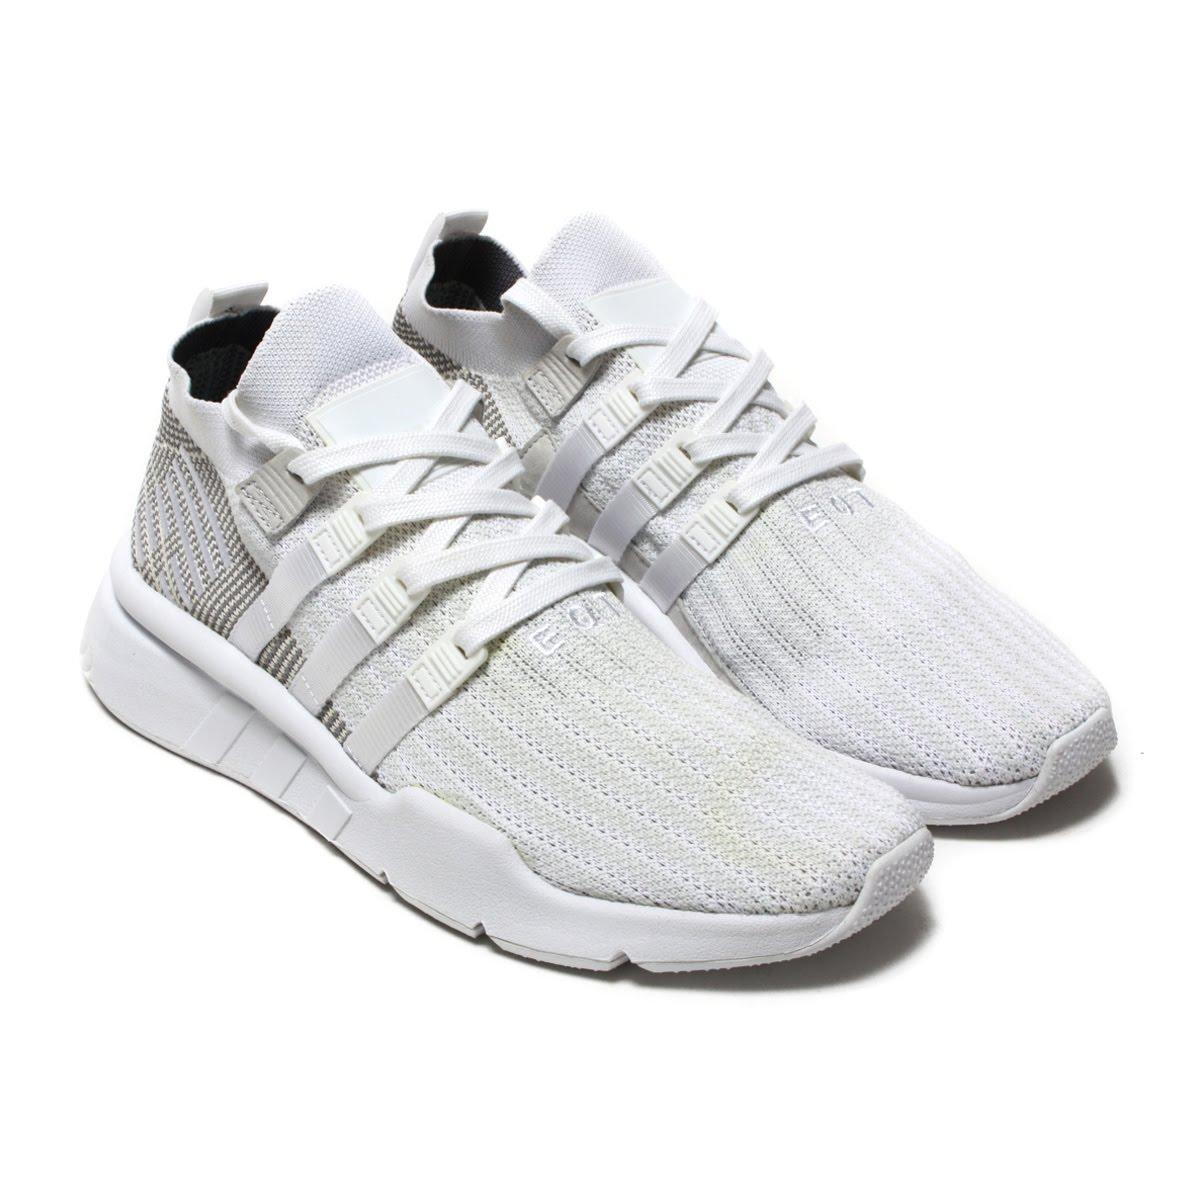 adidas Originals EQT SUPPORT MID ADV PK(アディダス オリジナルス イーキューティー サポート ミッド ADV PK)Running White/Running White/Grey18SS-I